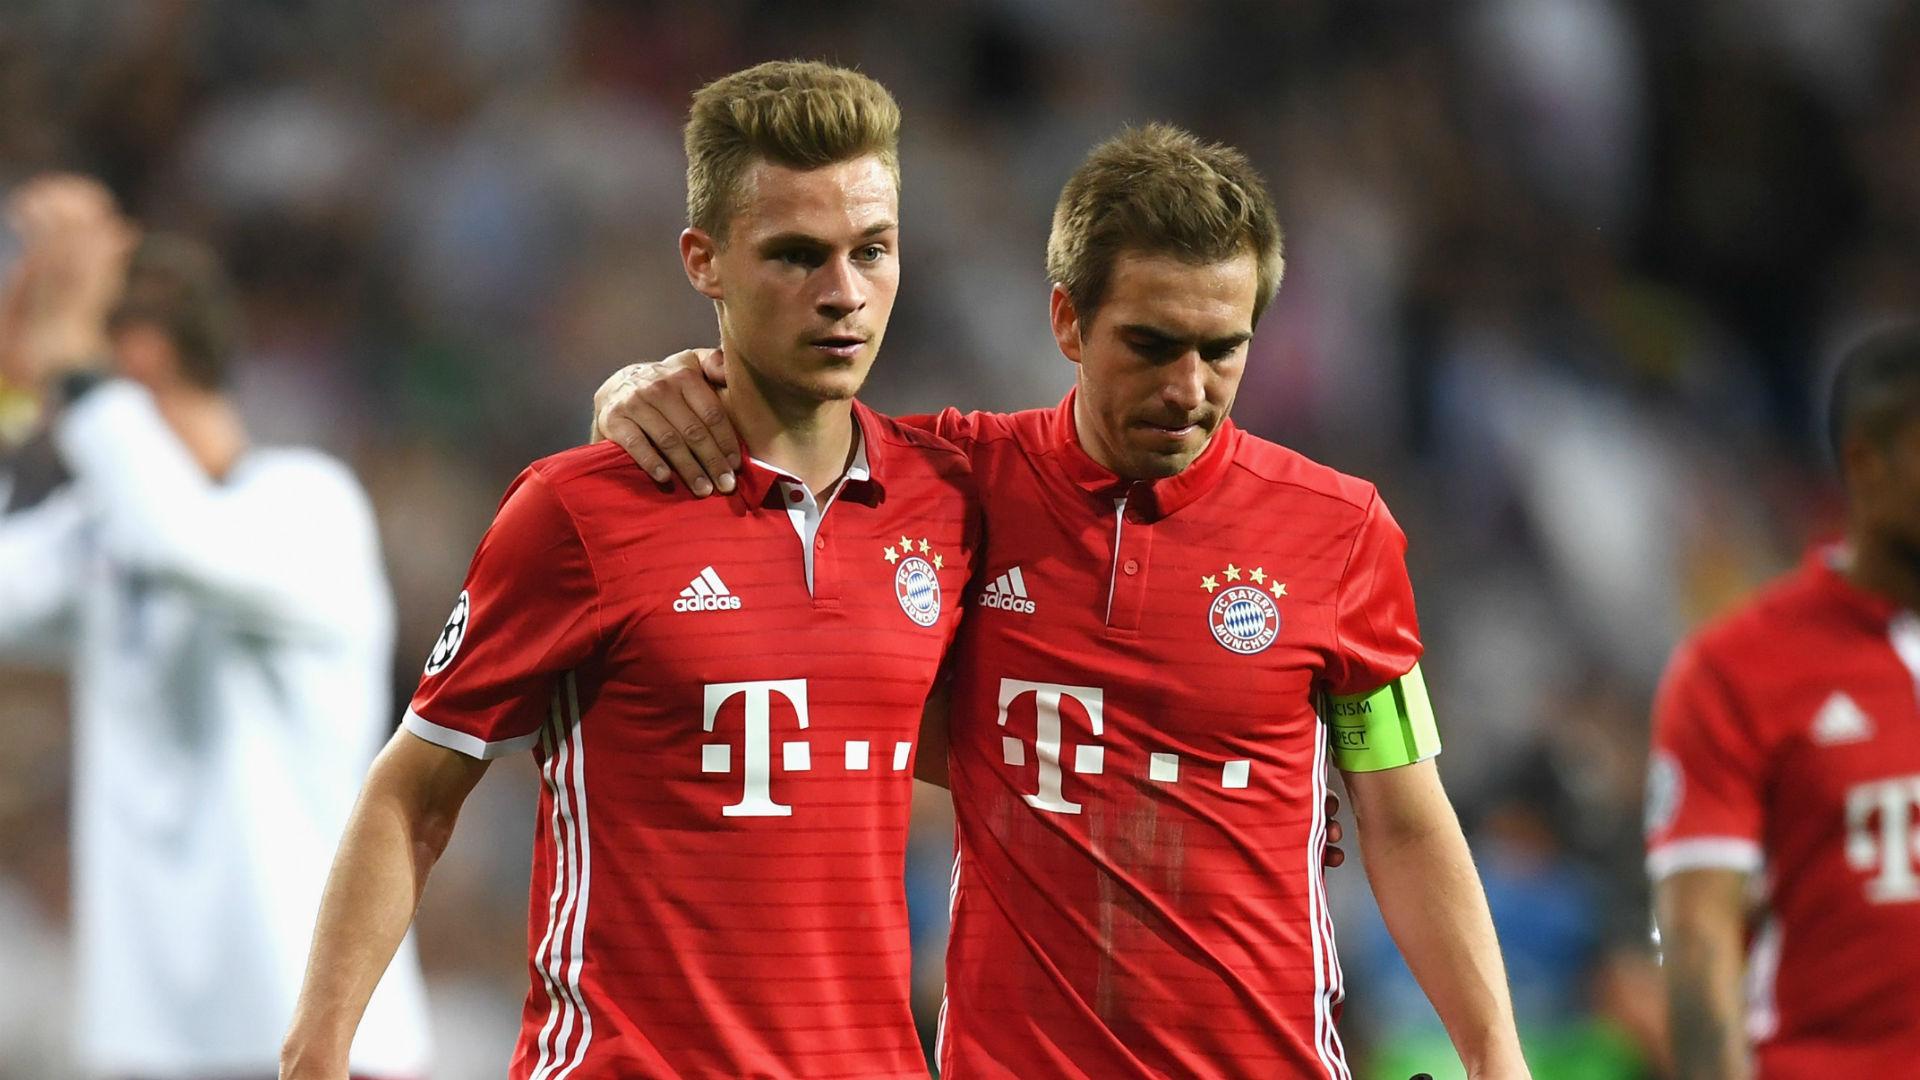 Bayern Munich news: Joshua Kimmich the natural heir to Philipp Lahm, says  Carlo Ancelotti | Goal.com